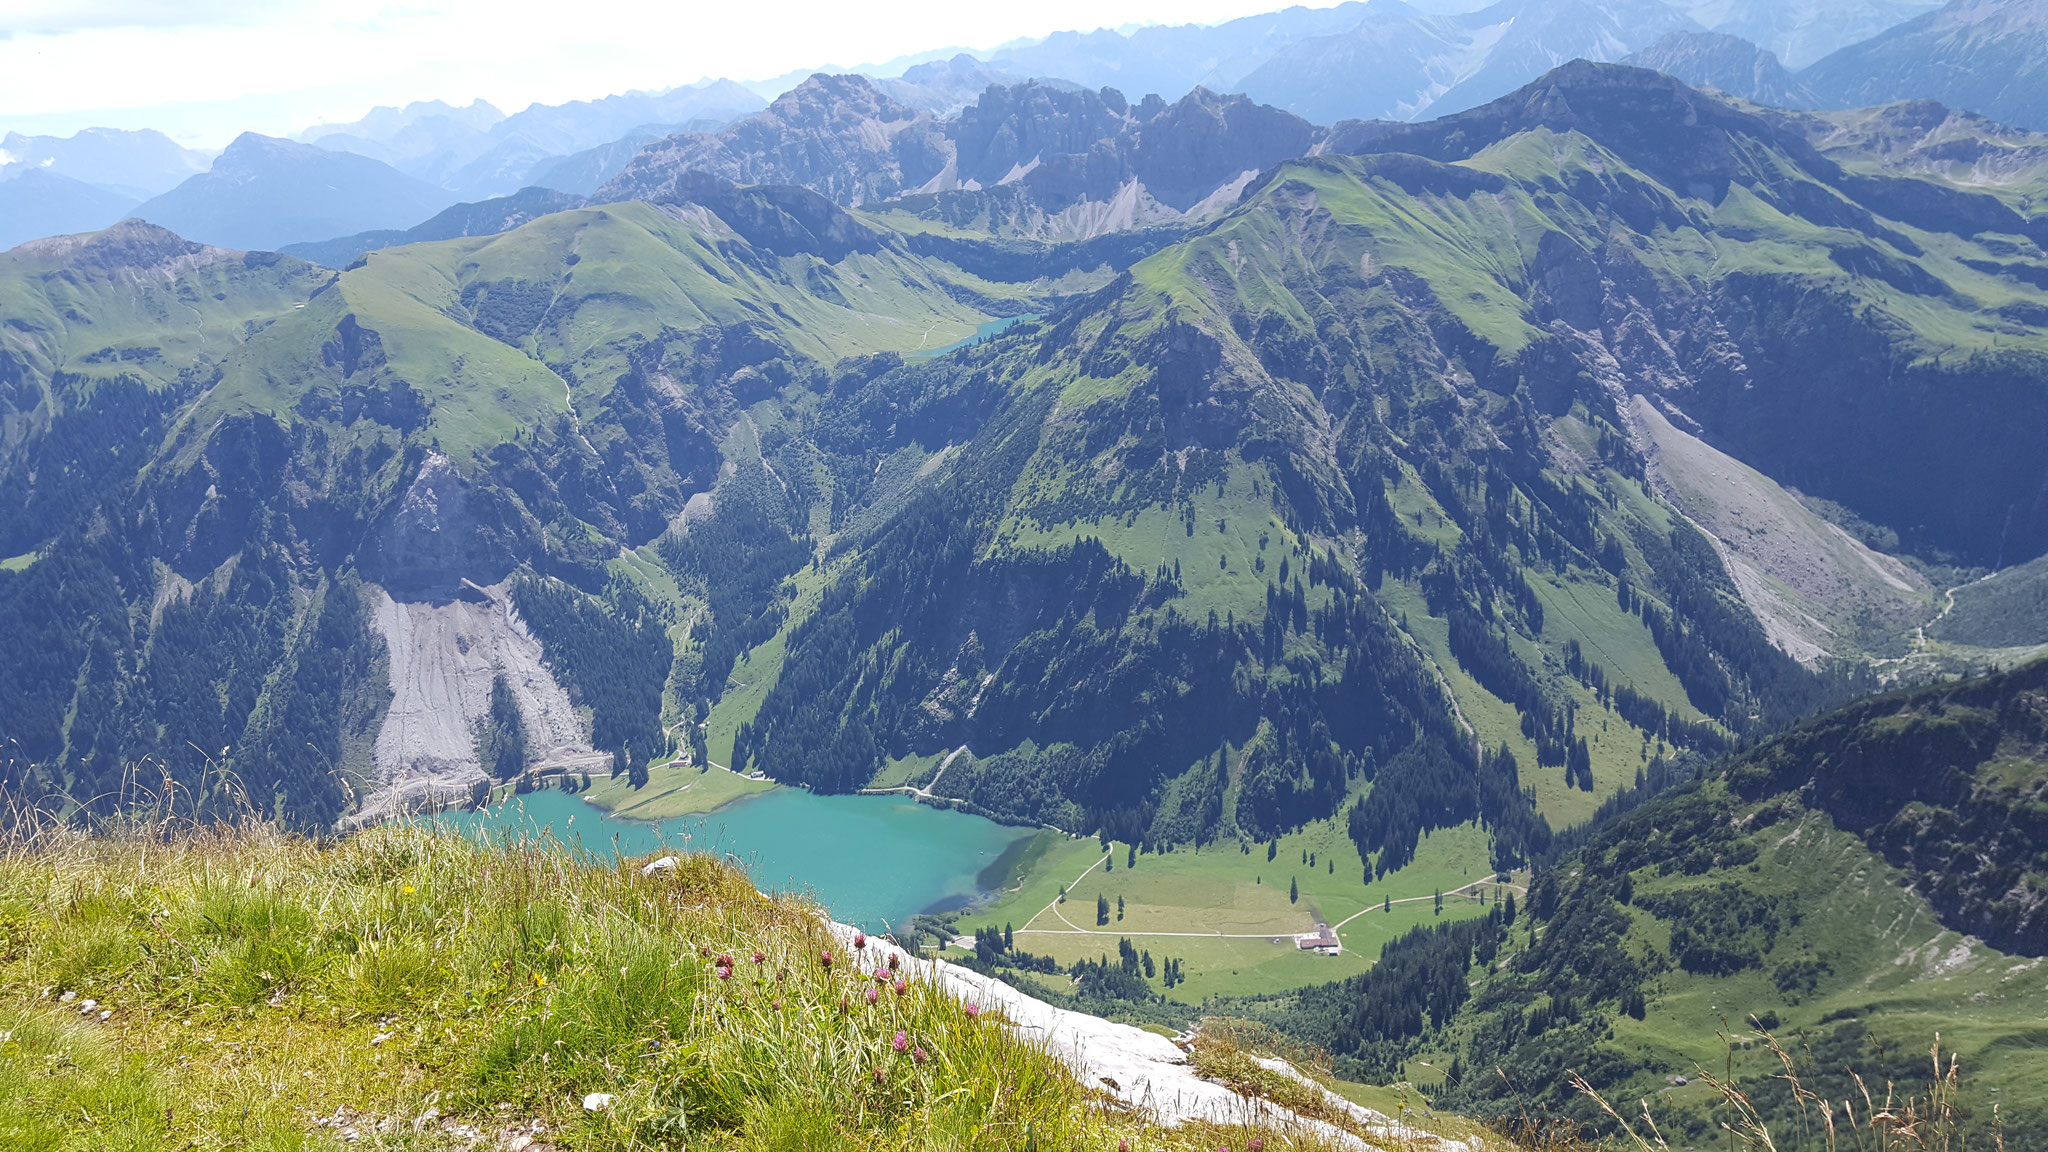 Blick vom Gipfel auf den Vilsalpsee